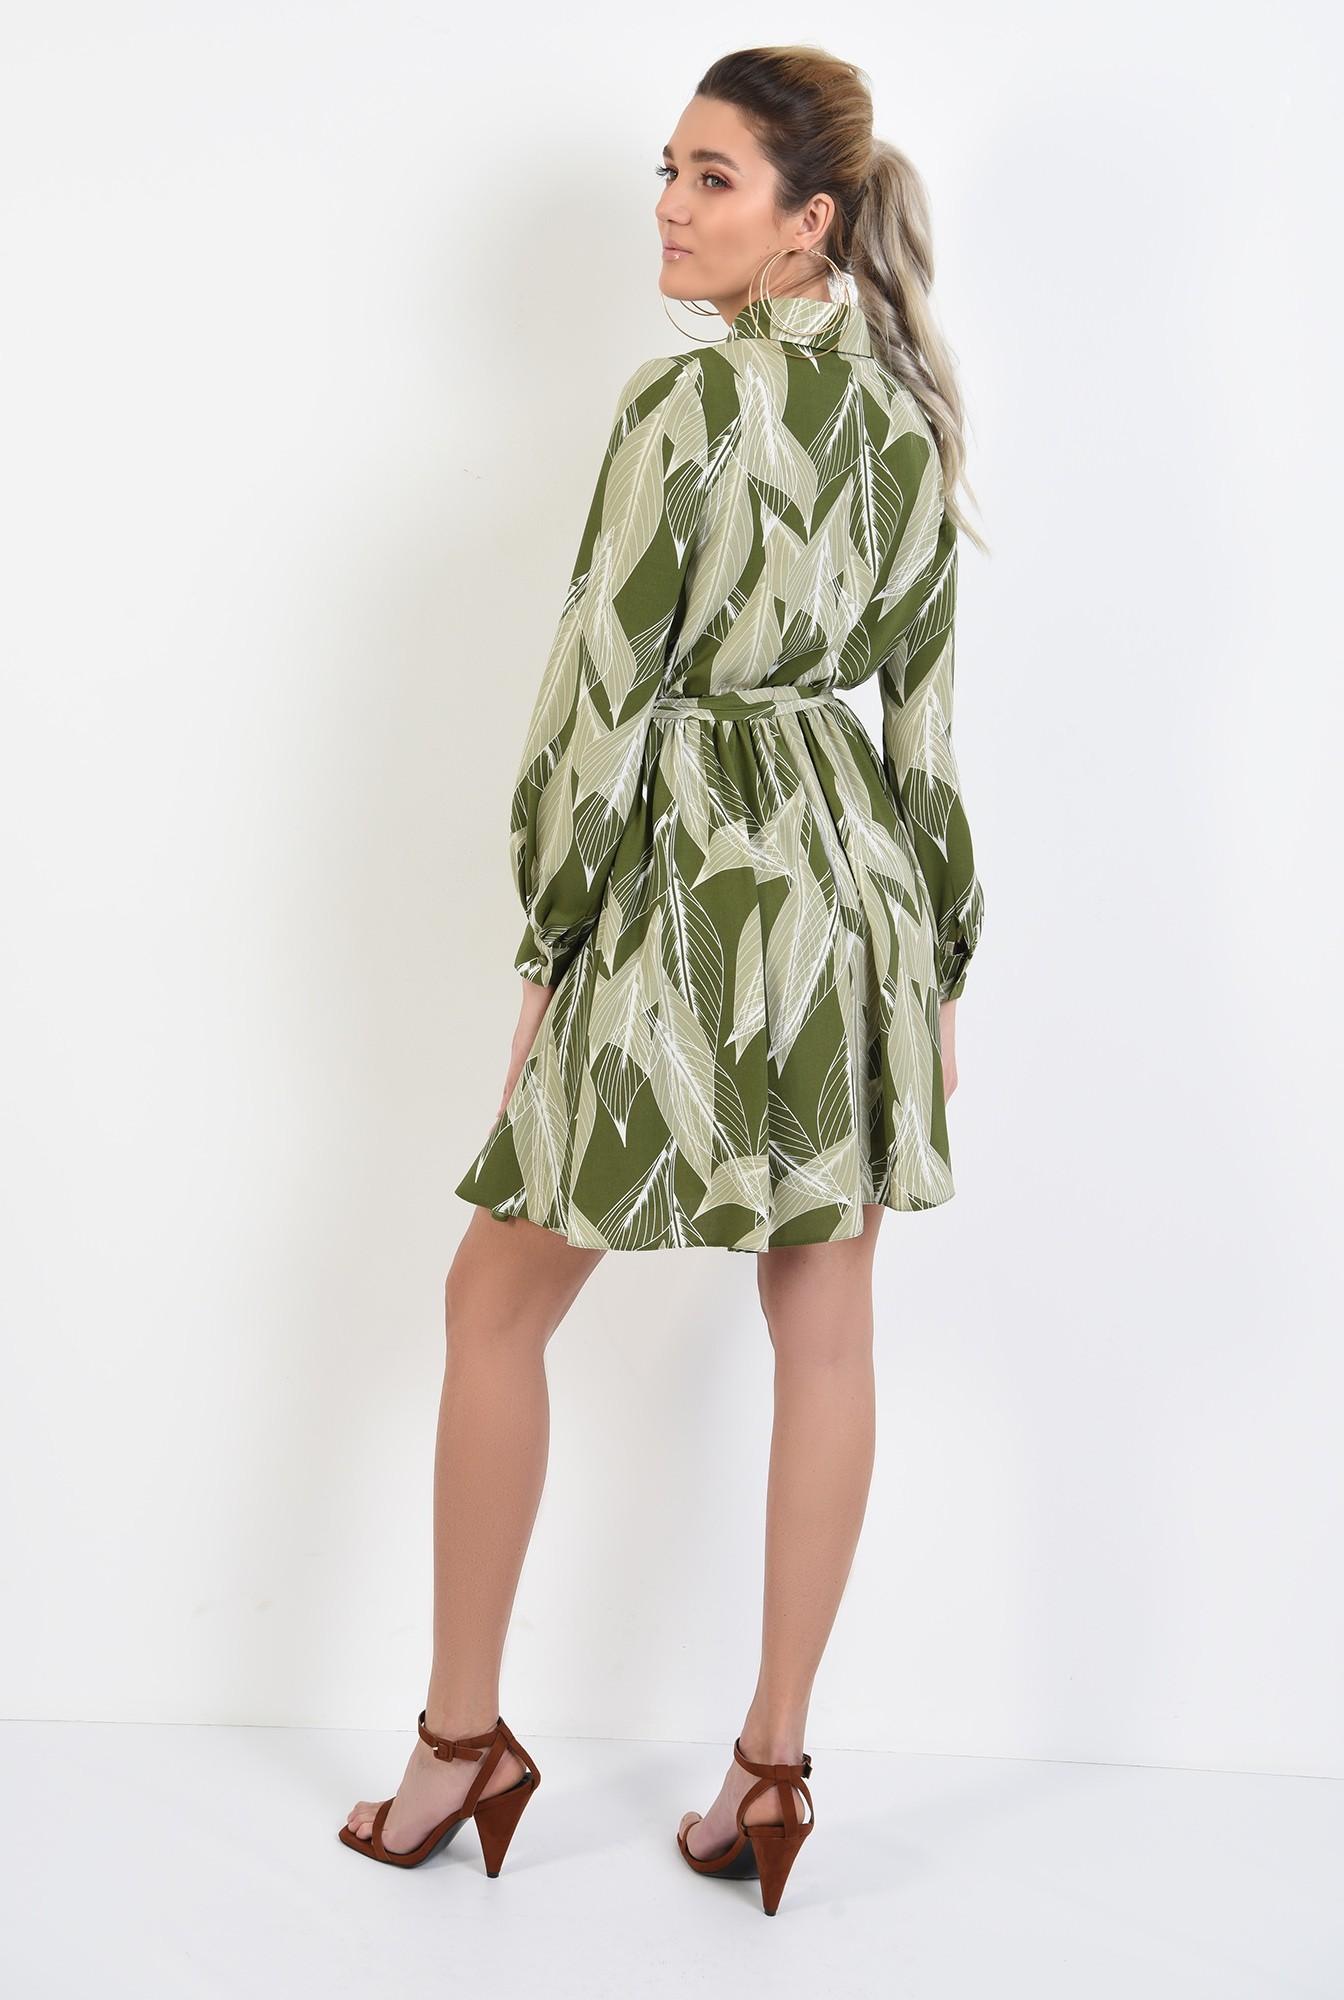 1 - 360 - rochie mini, cu print botanic, maneci lungi, nasturi, cordon